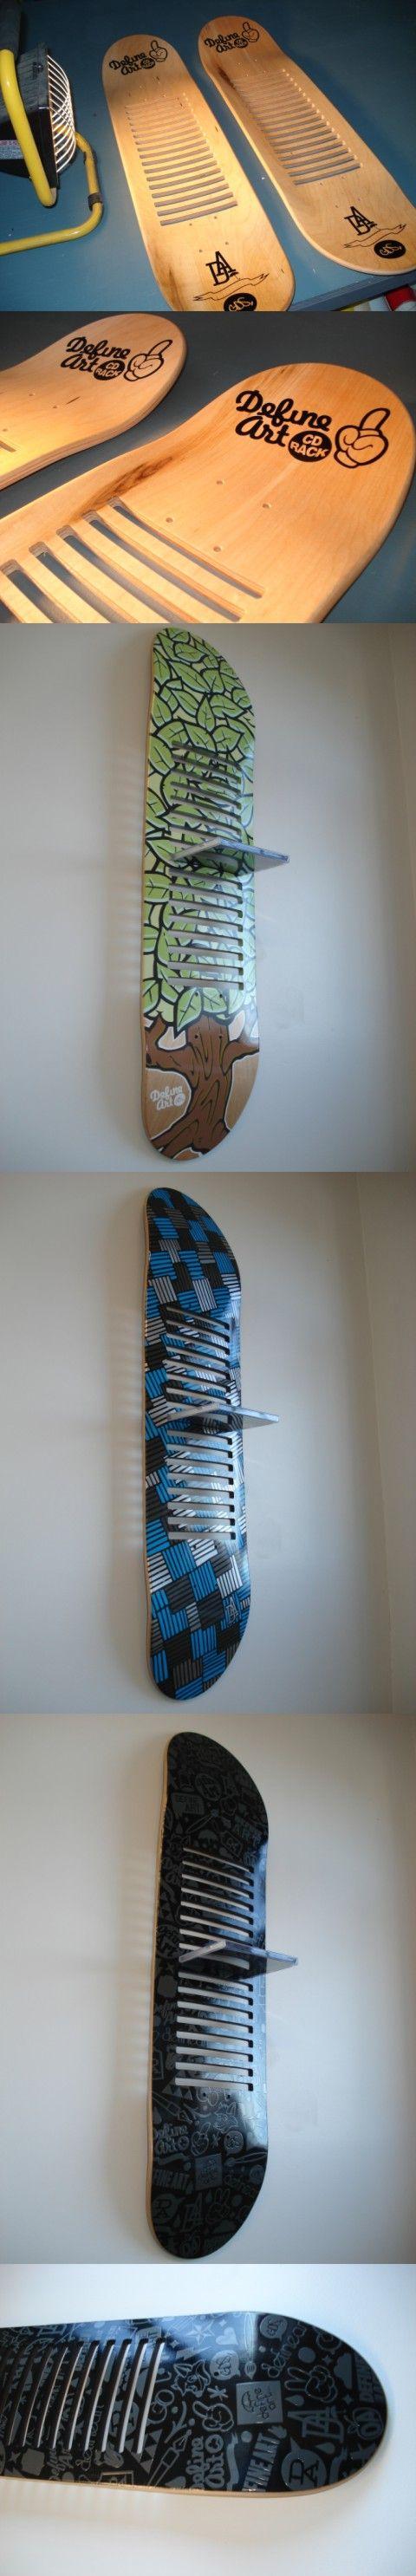 DefineArt CD racks (skateboards) by Glenn Smith, via Behance